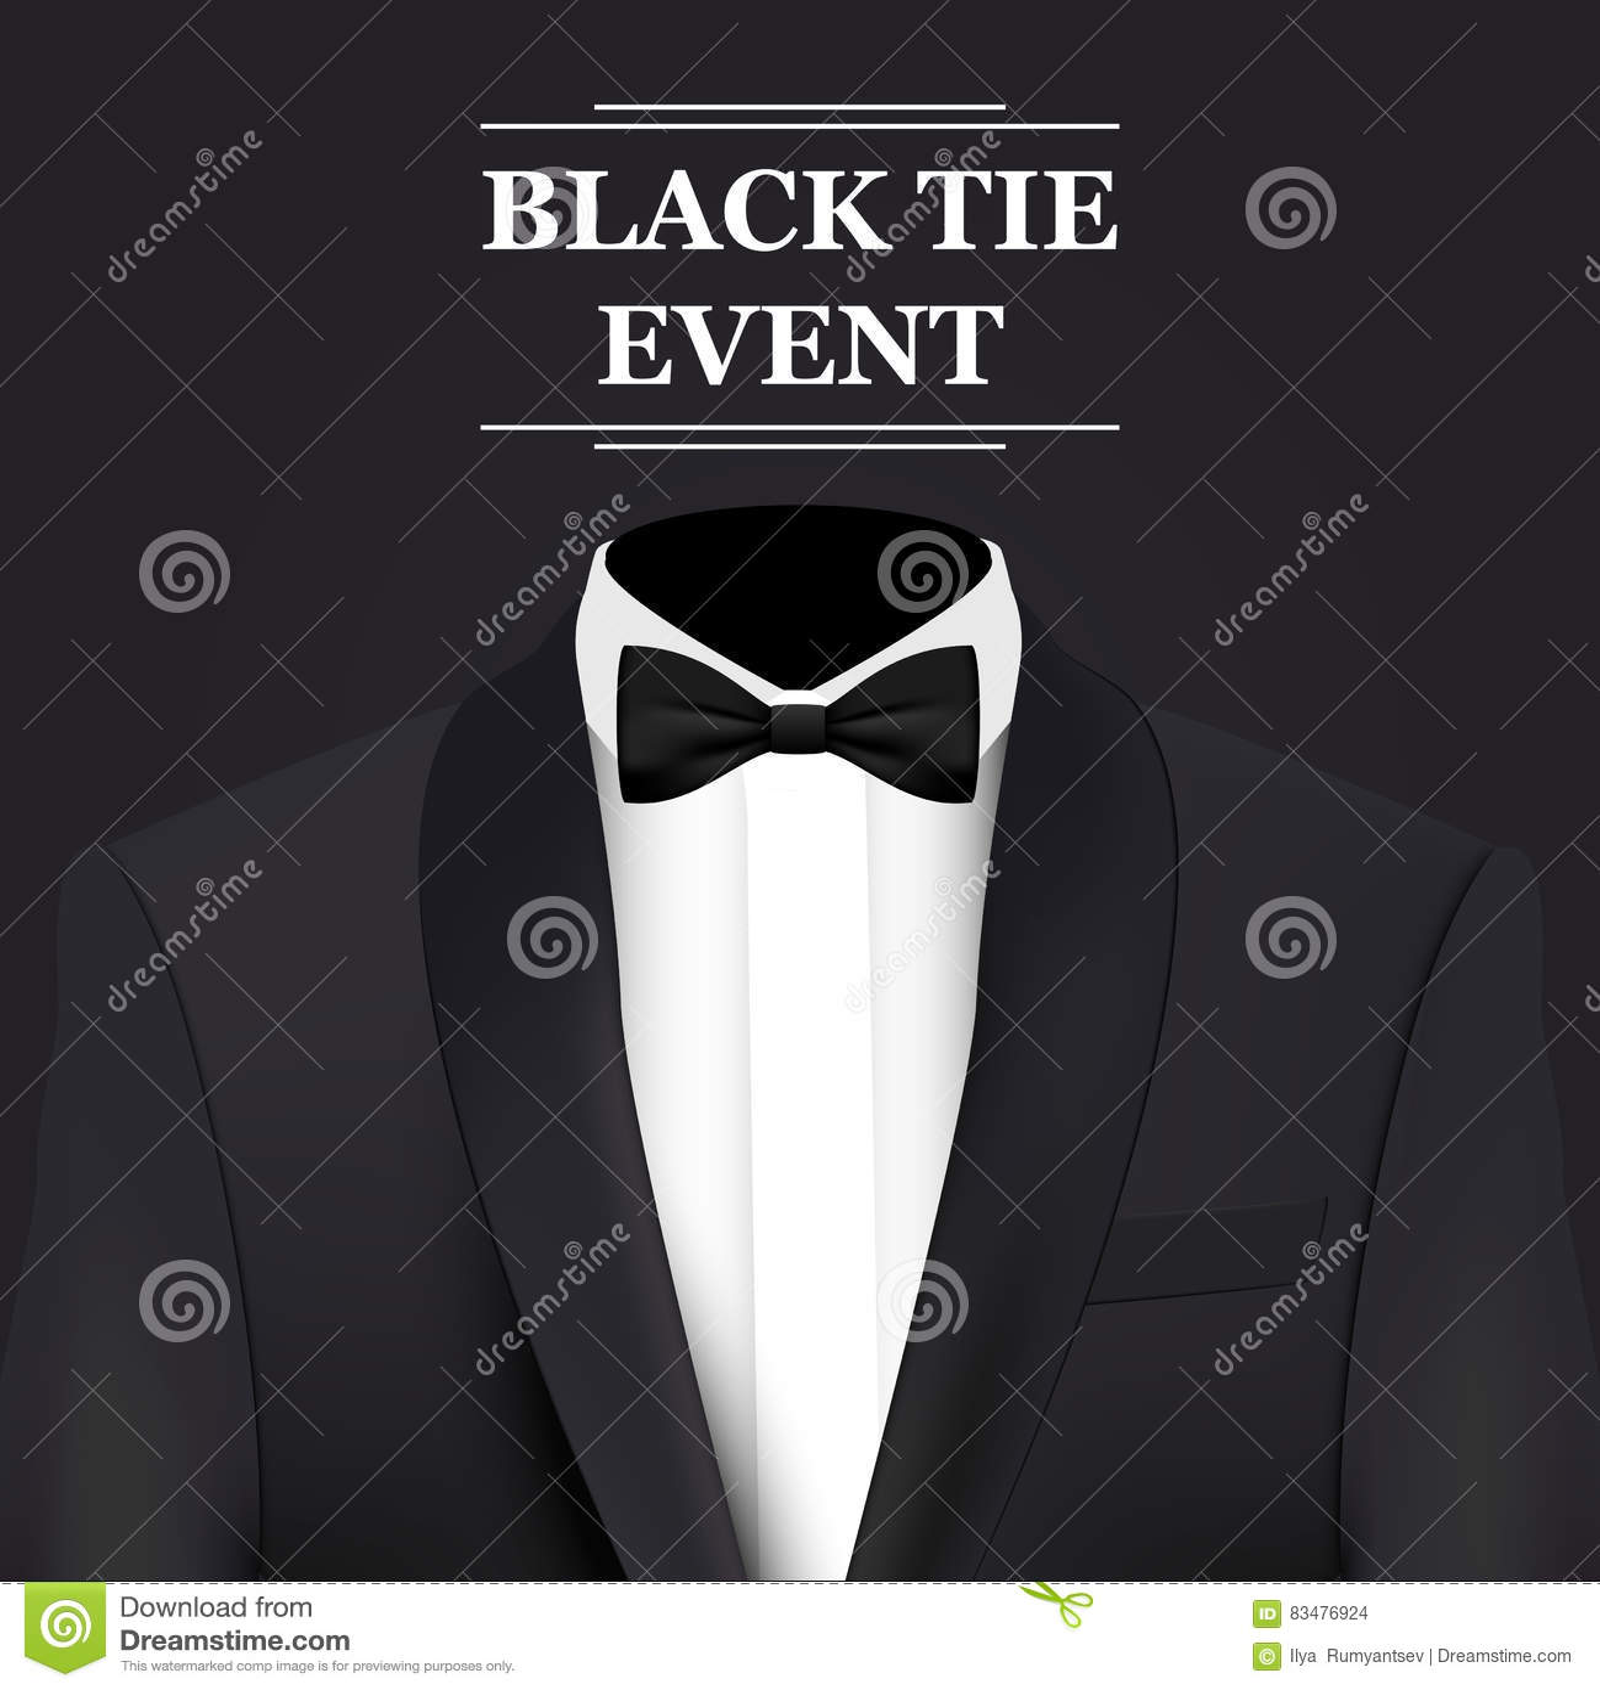 Black tie event invitation card stock vector illustration of black tie event invitation card royalty free vector download stopboris Images